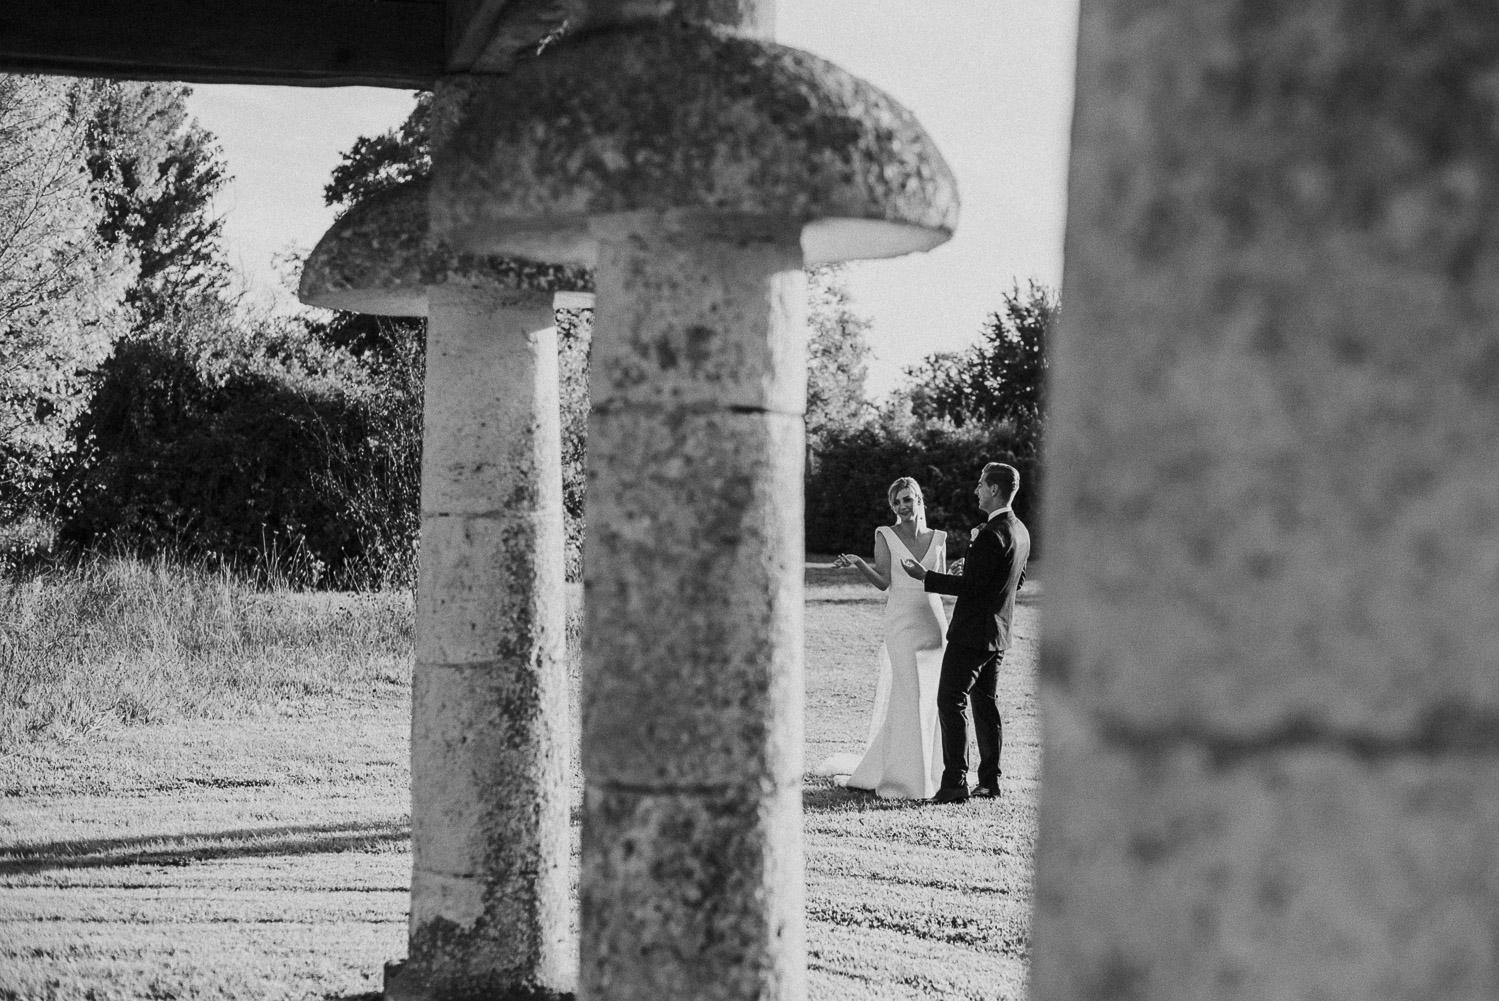 dordogne_eymet_wedding_france_katy_webb_photography_france_UK109